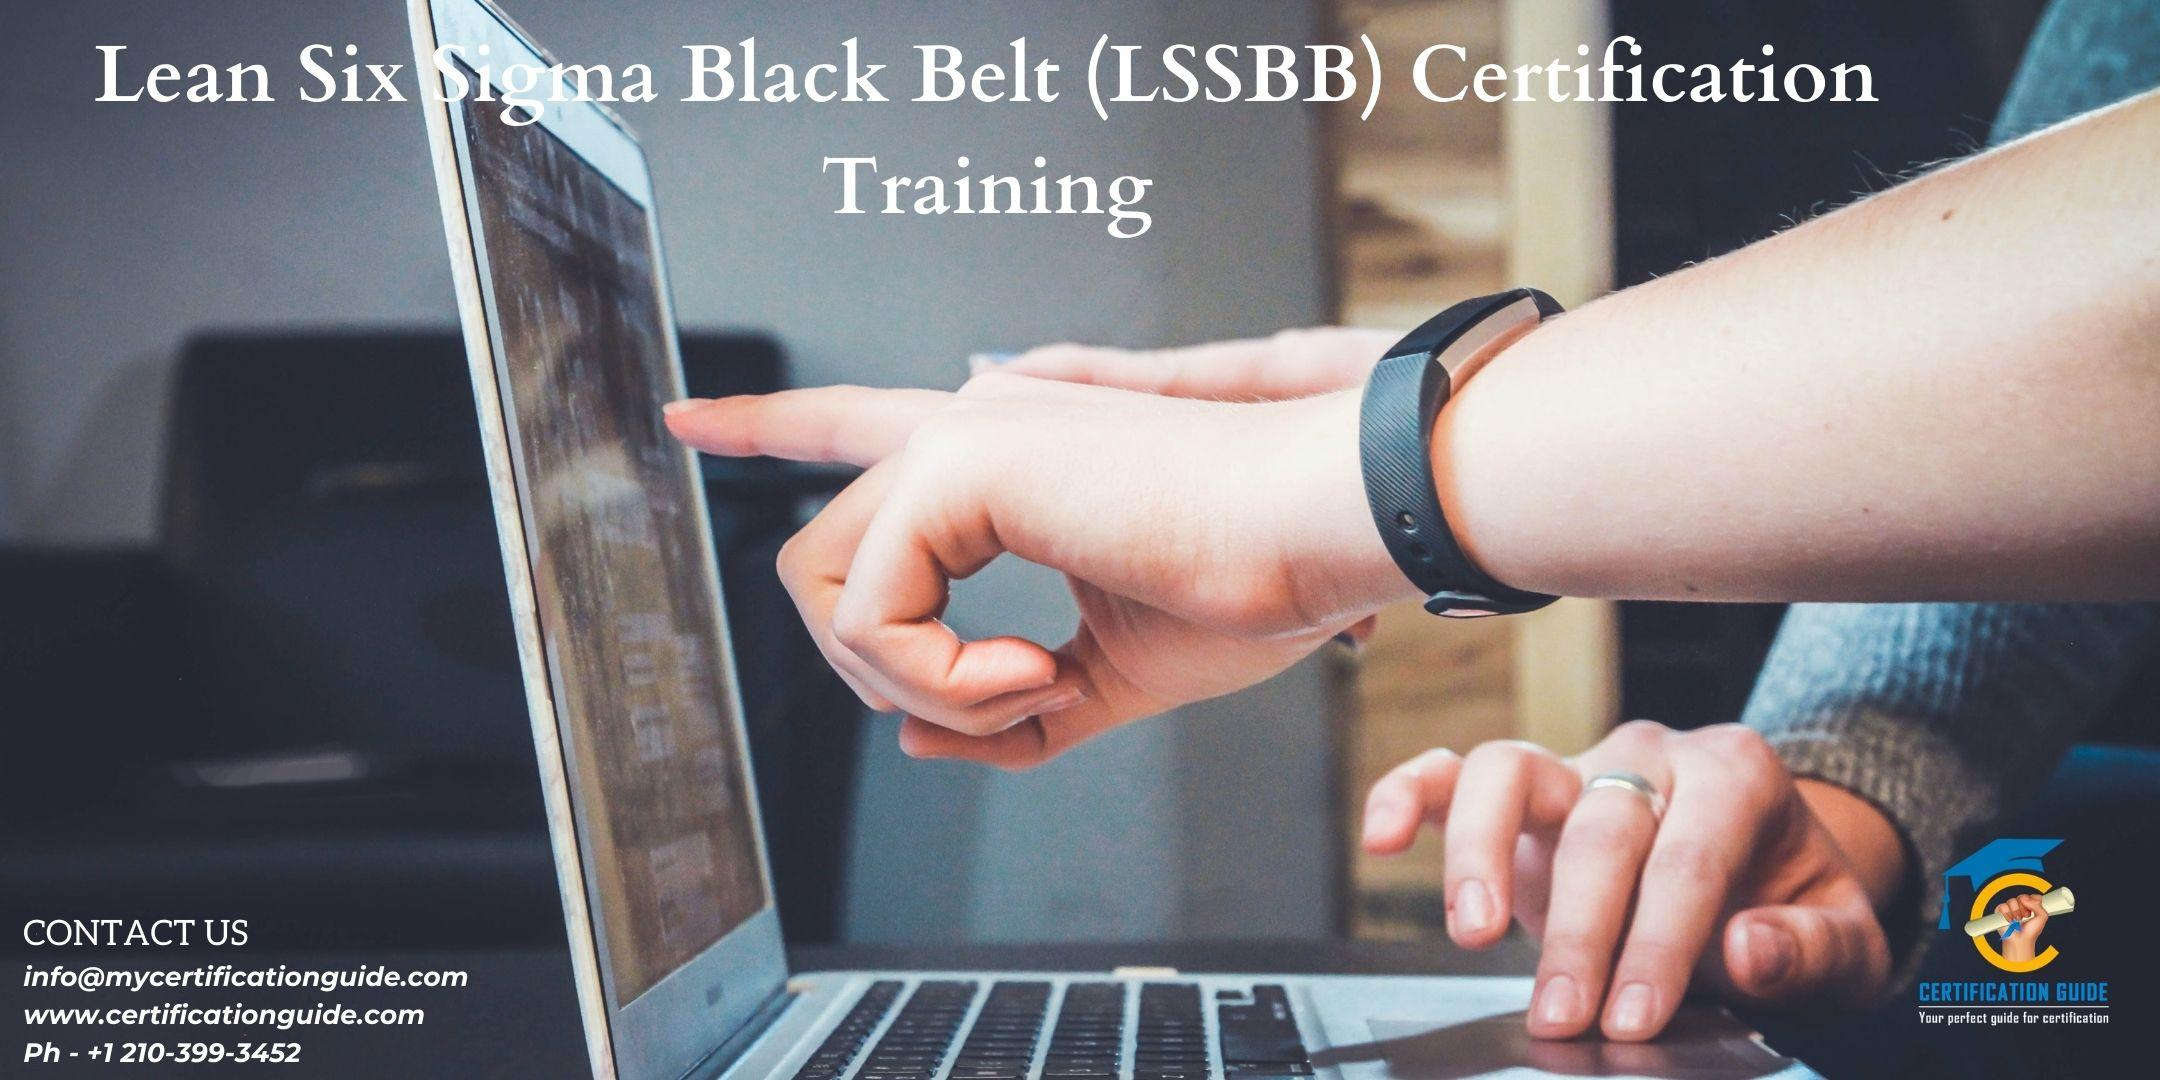 Lean Six Sigma Black Belt Certification Training in Montreal, QC